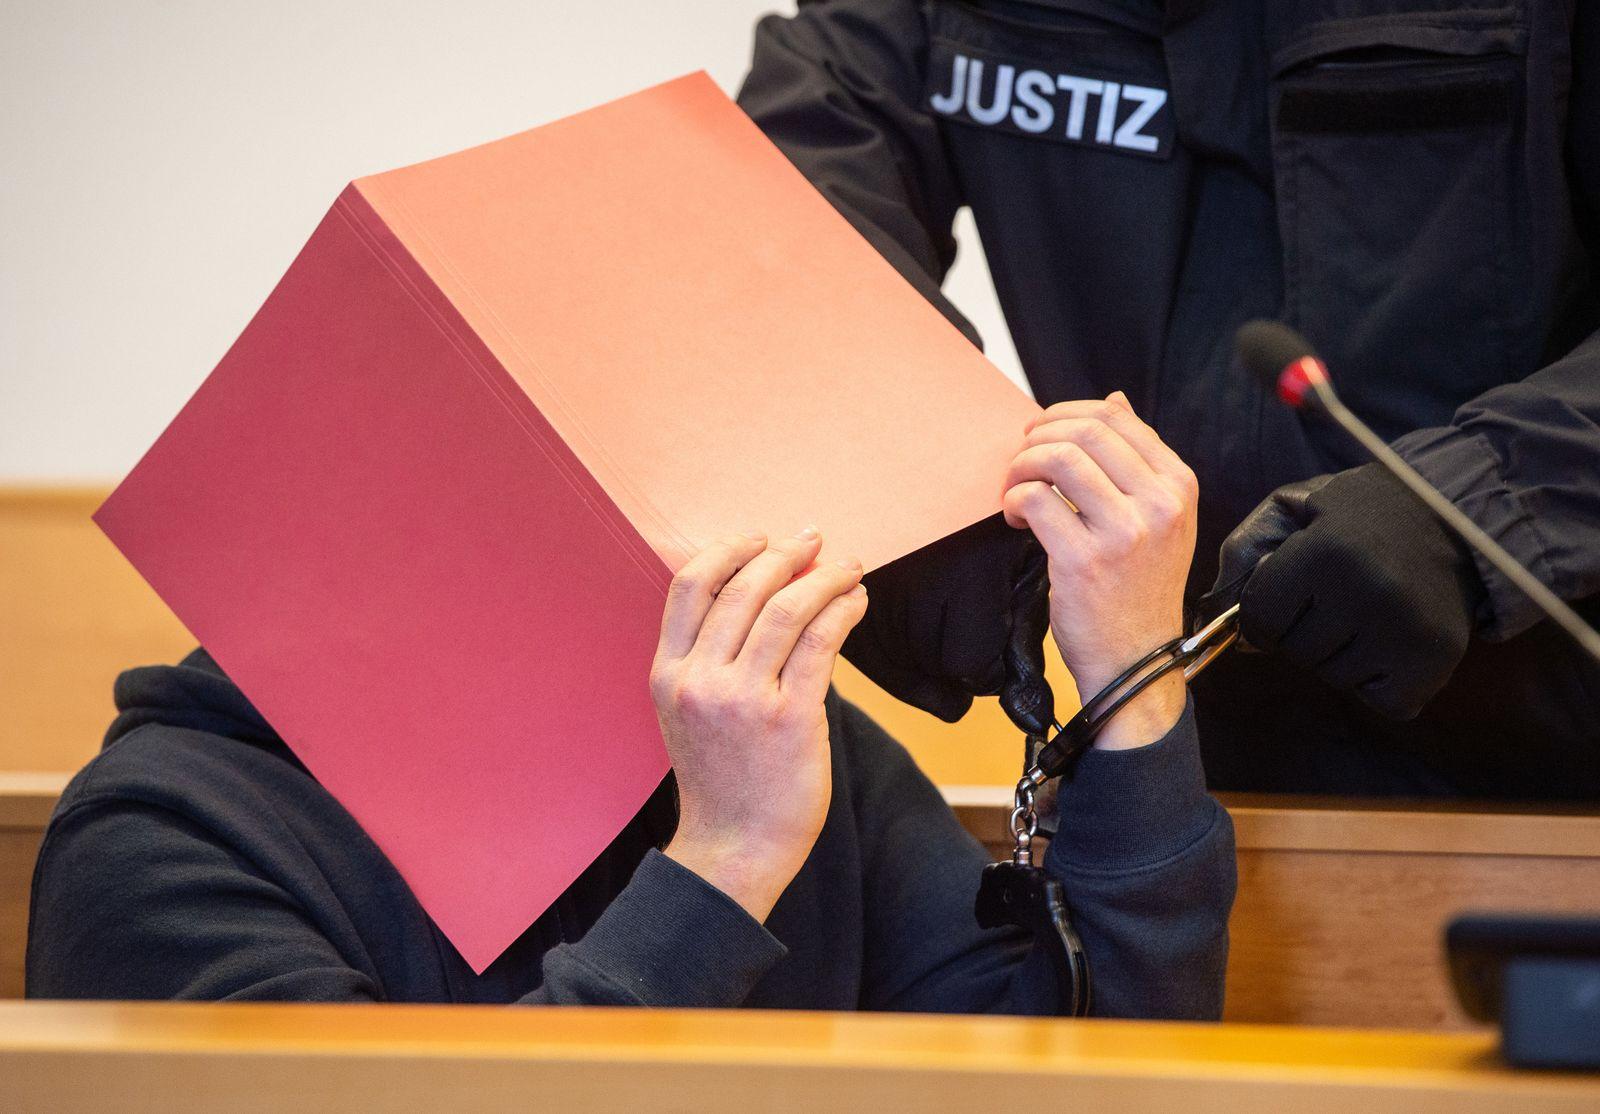 Prozess wegen Mordes an einer 61-jährigen Frau